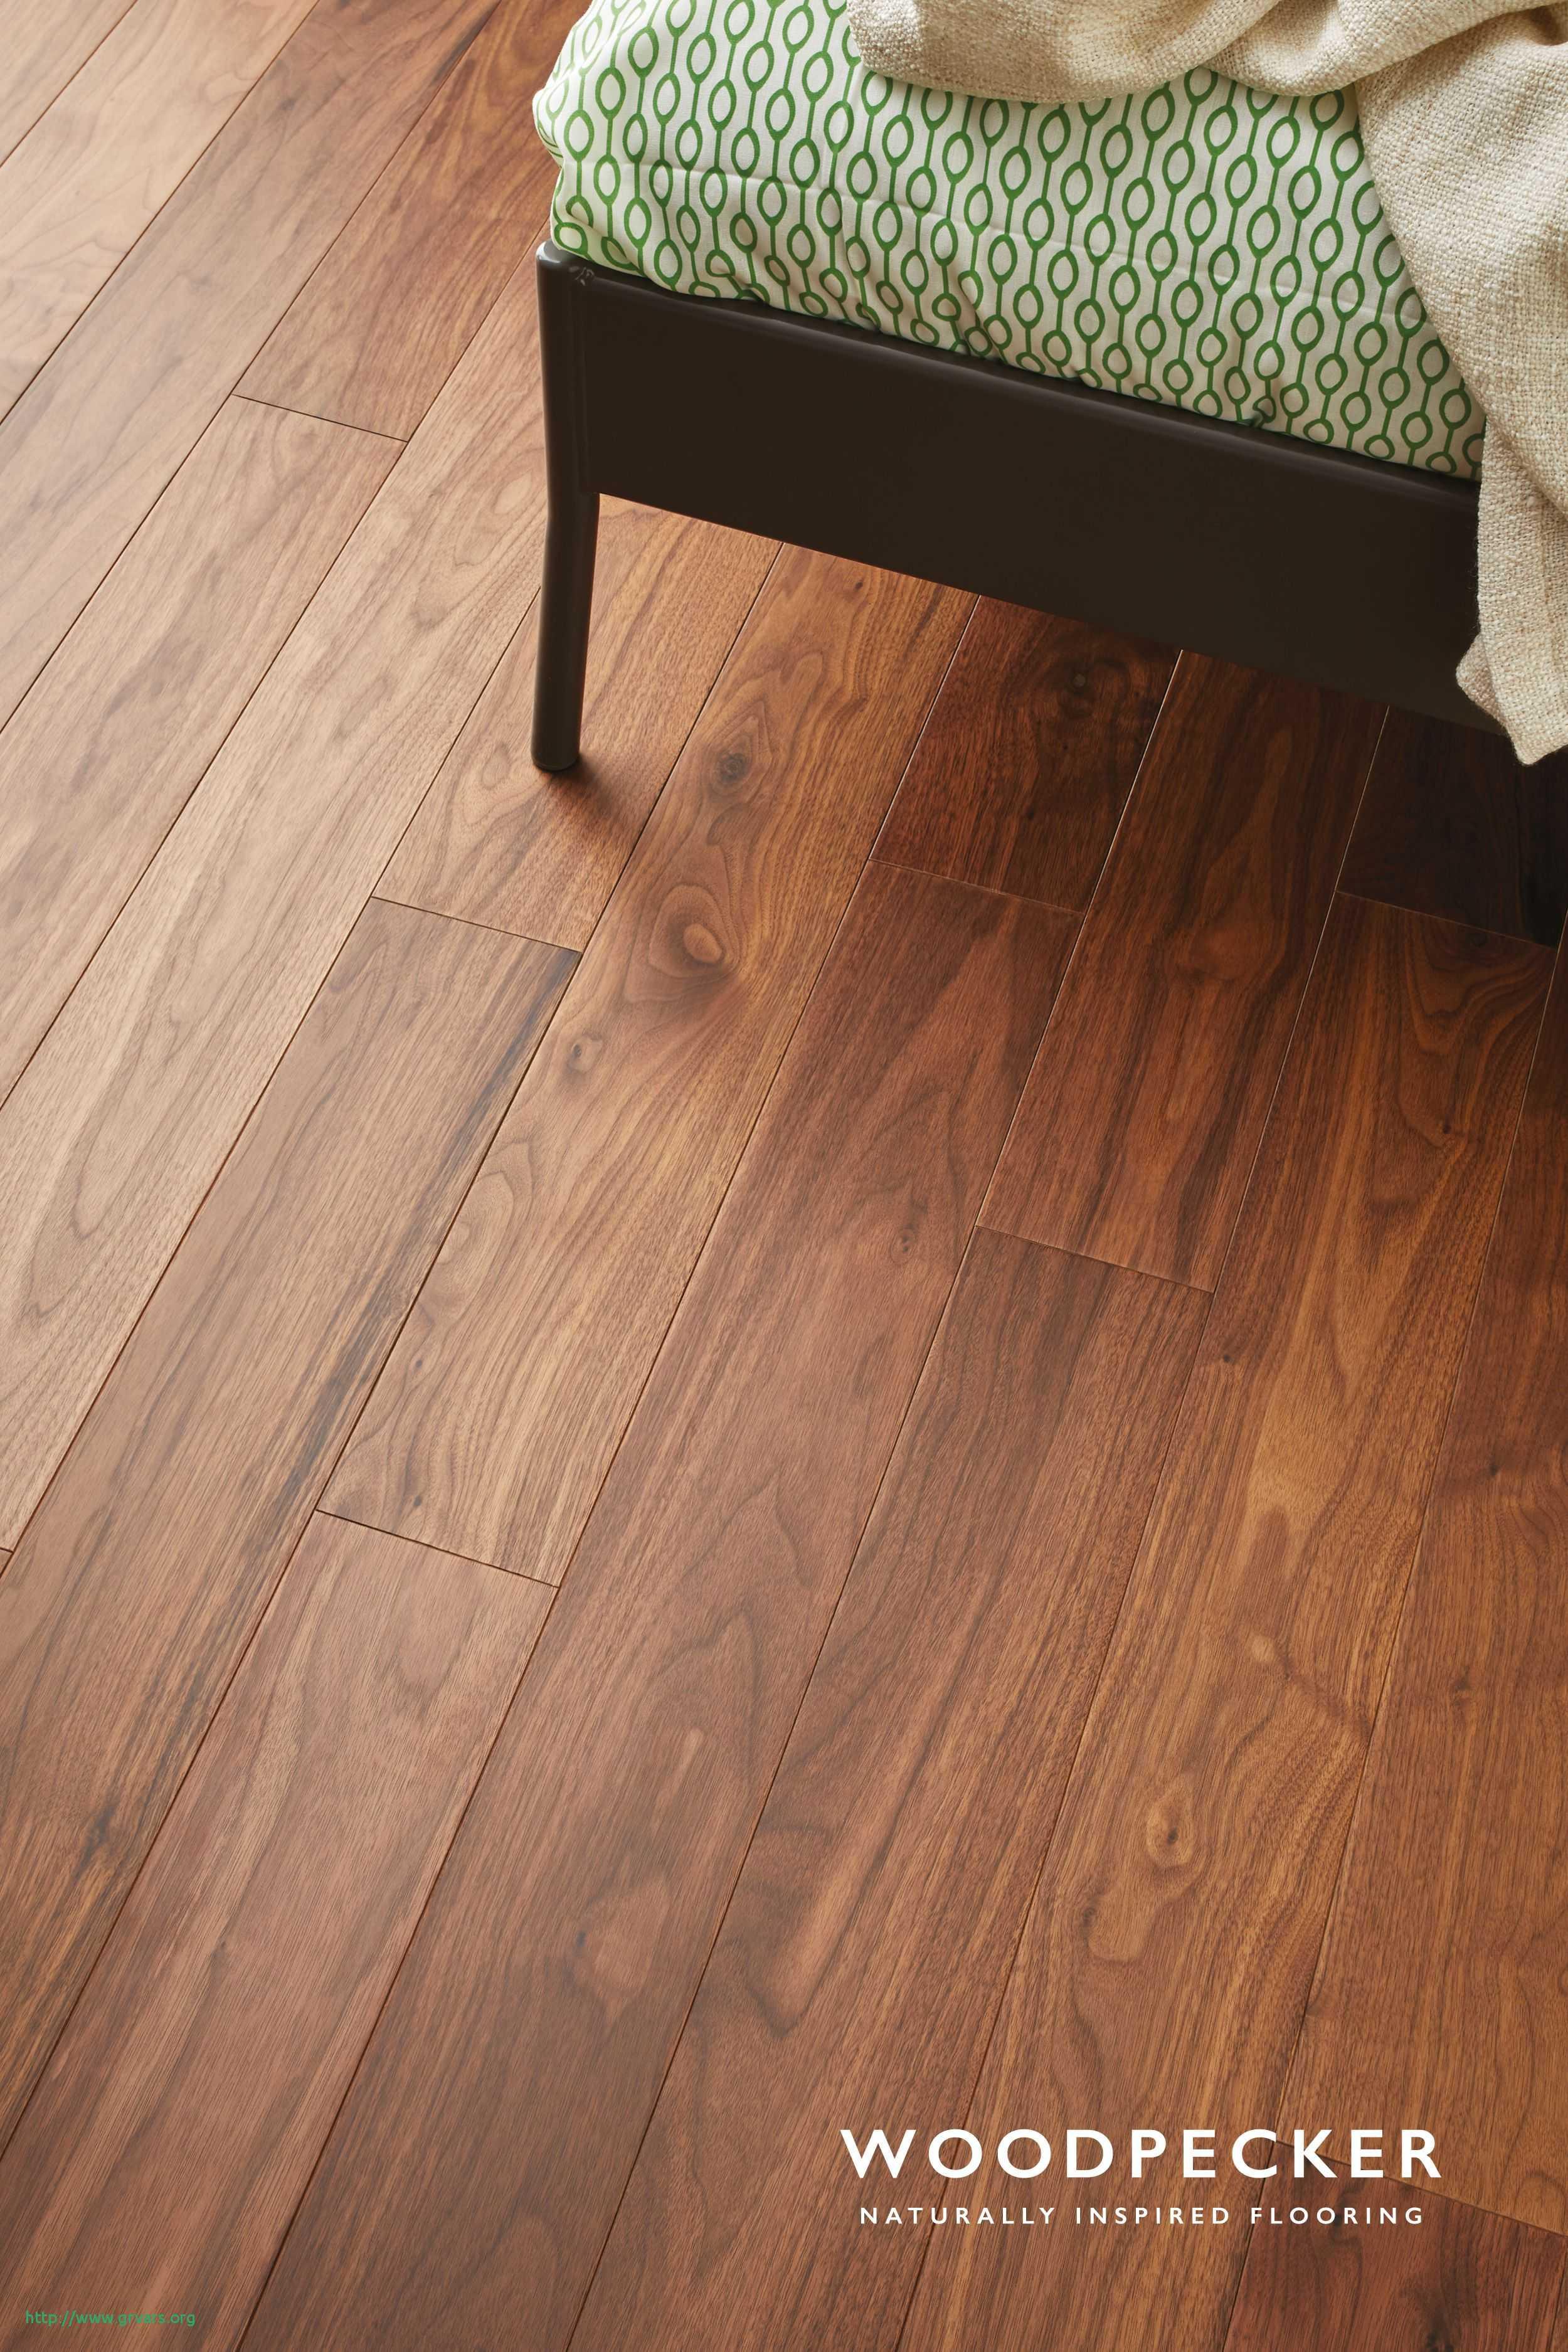 maple walnut hardwood flooring of 15 luxe wallnut floor ideas blog with wallnut floor impressionnant raglan walnut pinterest wallnut floor impressionnant walnut hardwood